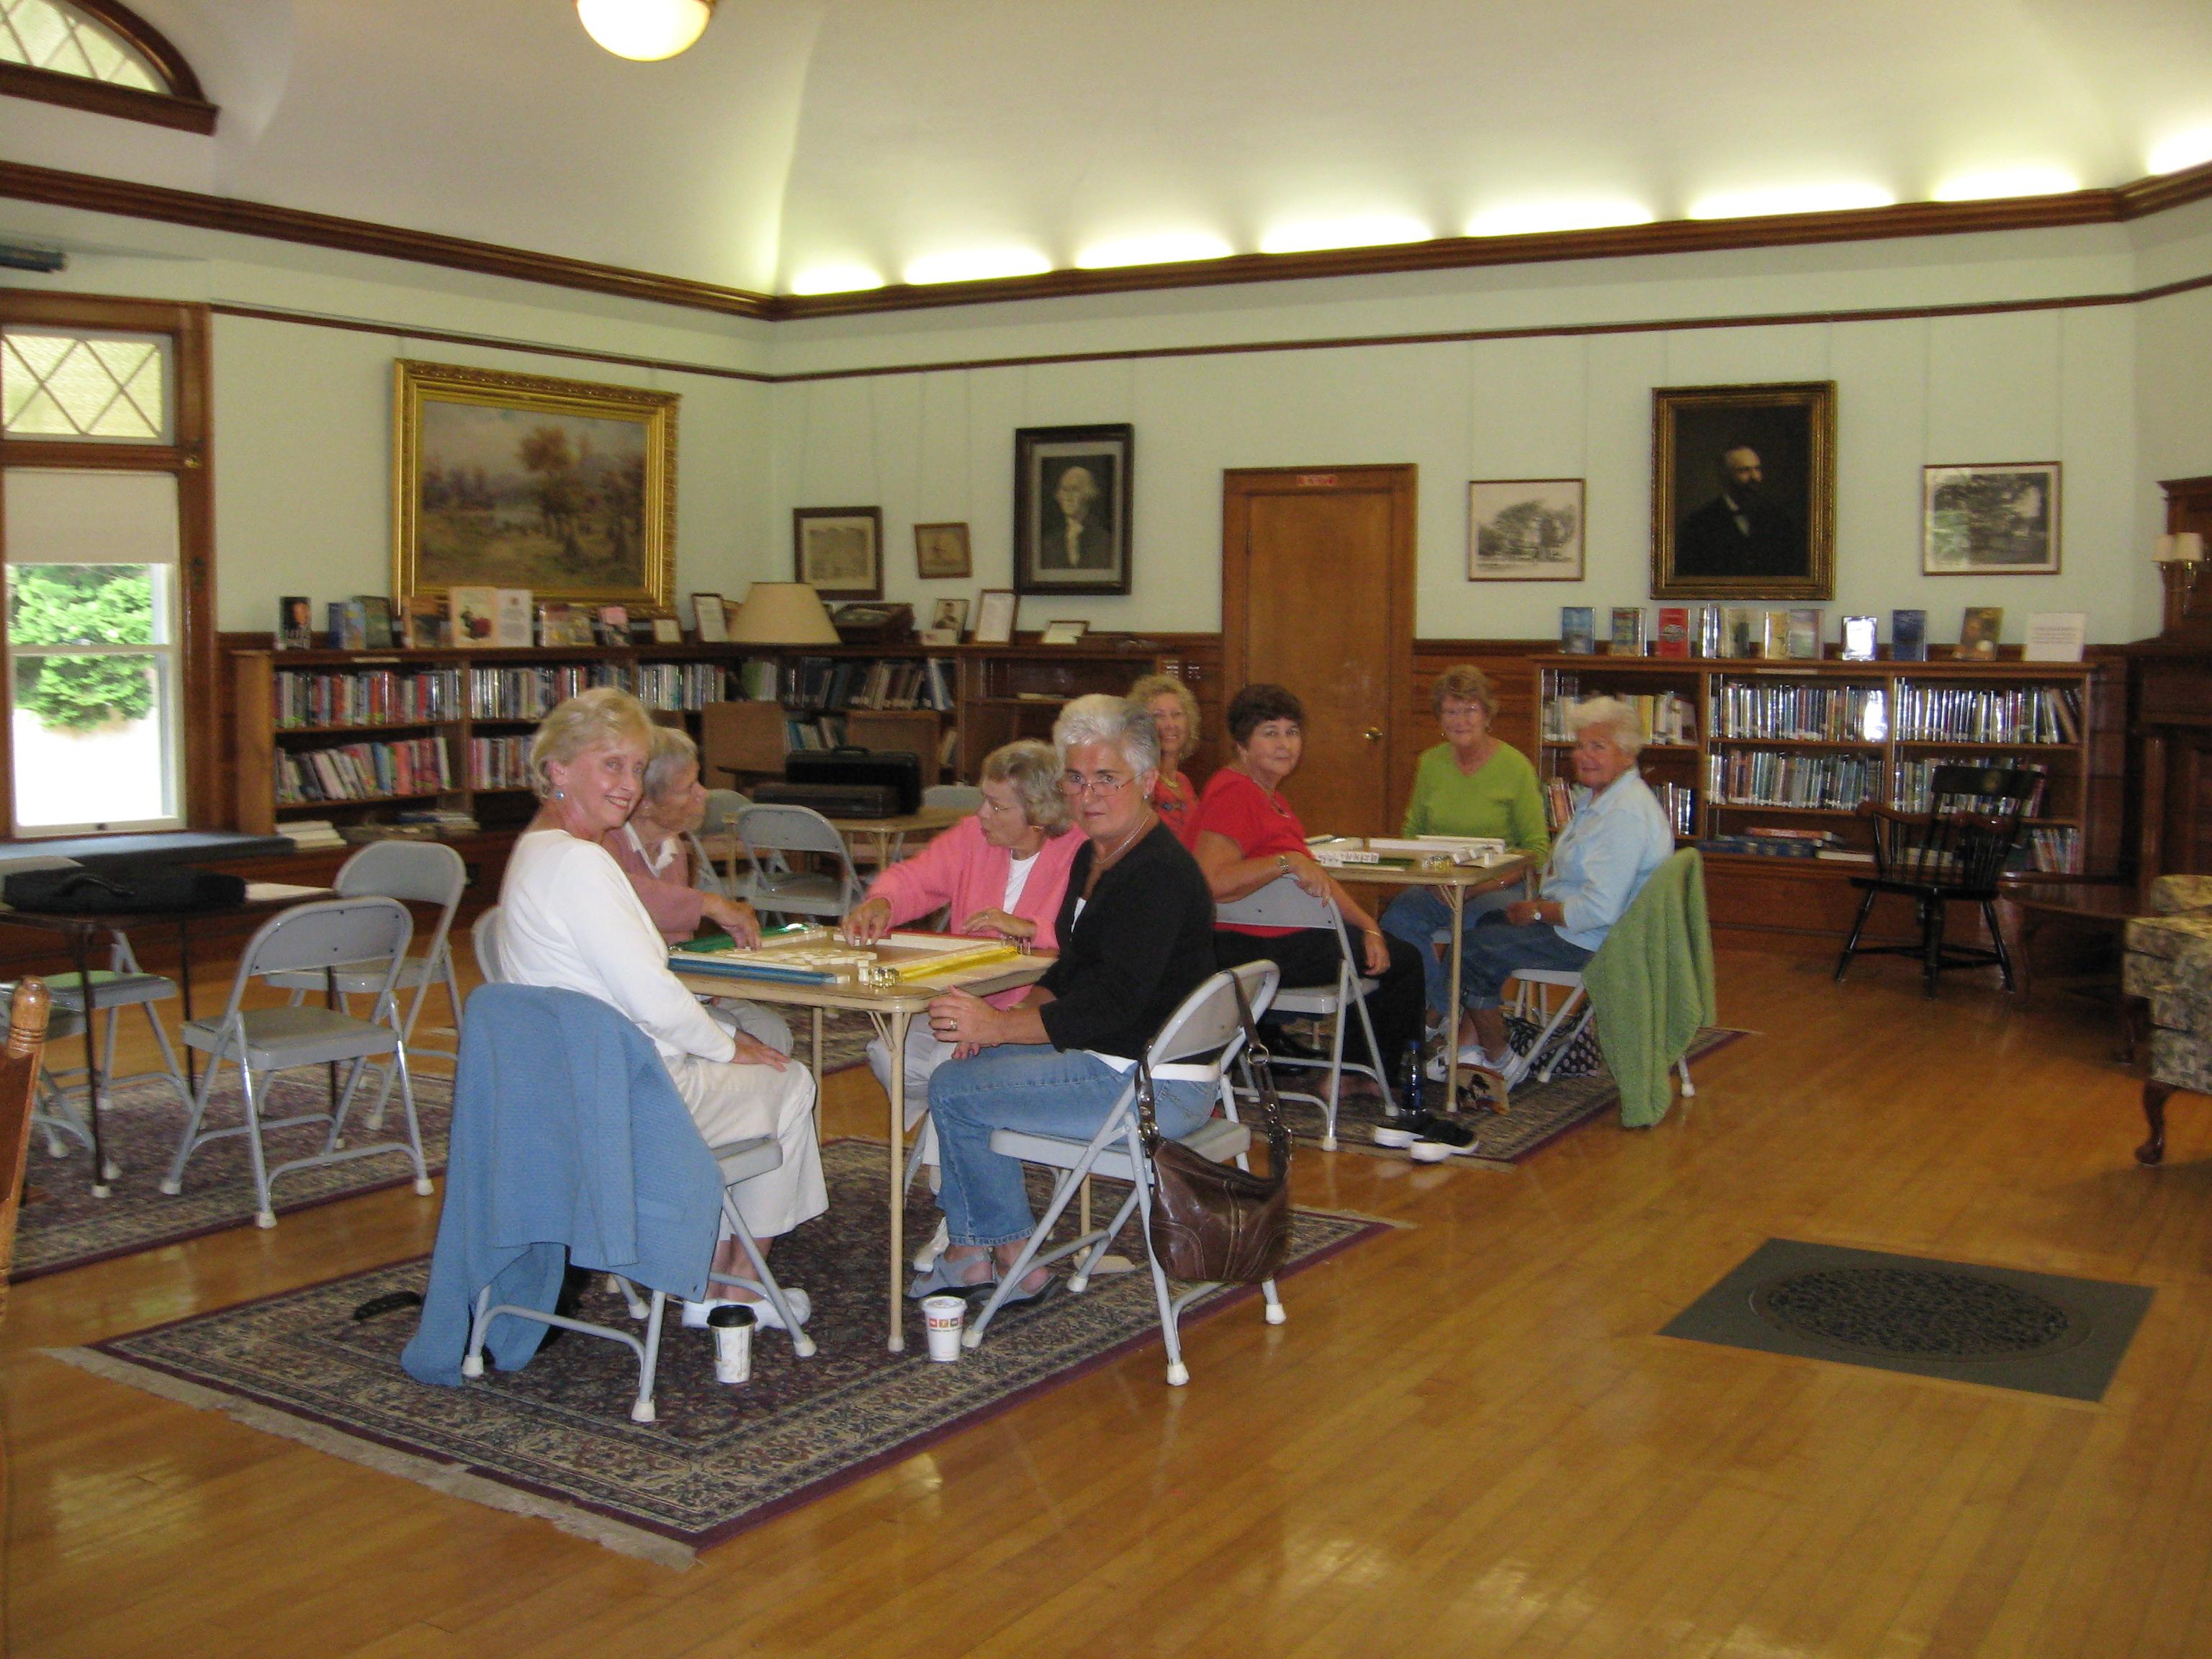 Playing mah jong at the West Falmouth Library